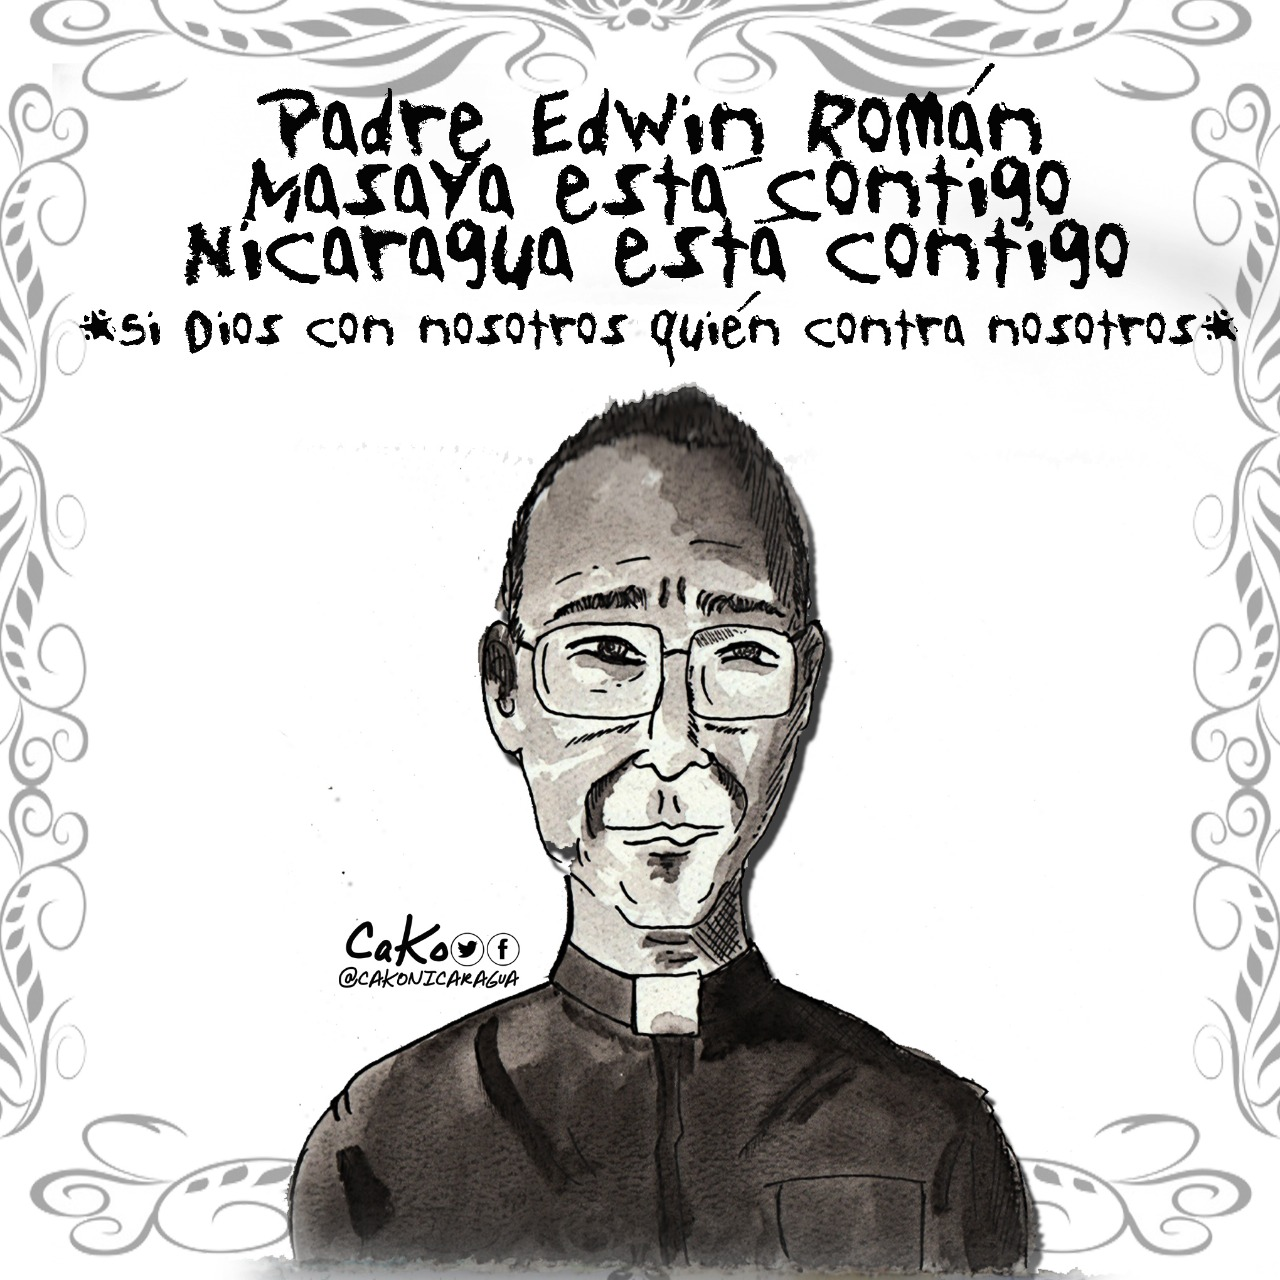 La Caricatura: Feliz Cumpleaños Padre Edwing